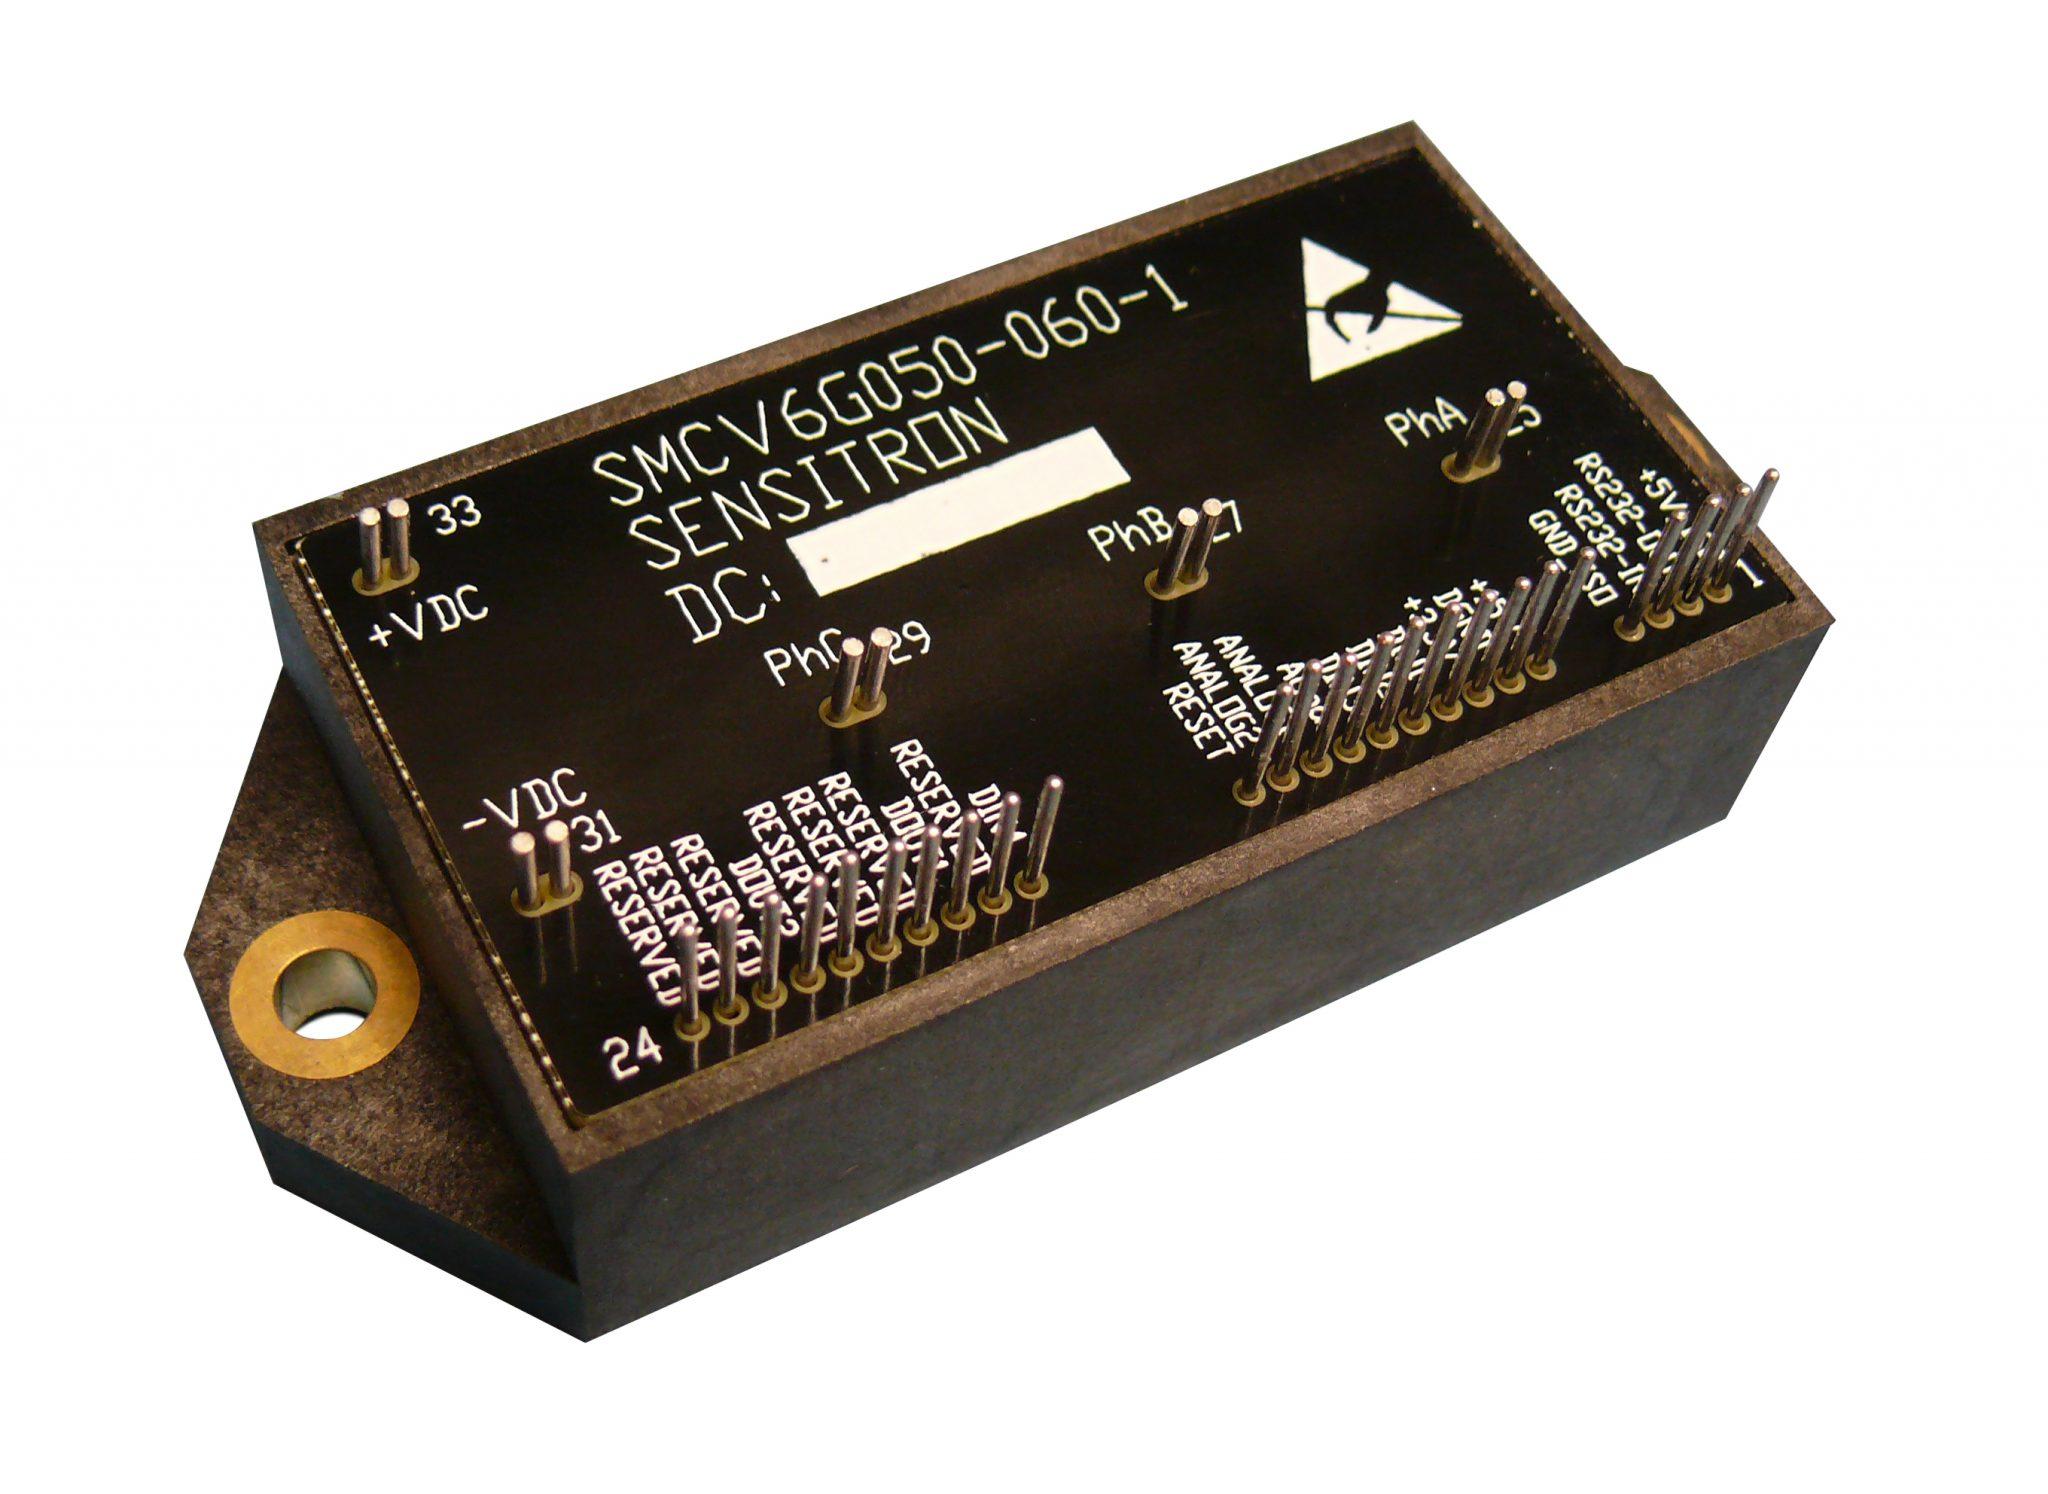 SMCV6 FOC-Sensorless Digital Vector Motor Drive